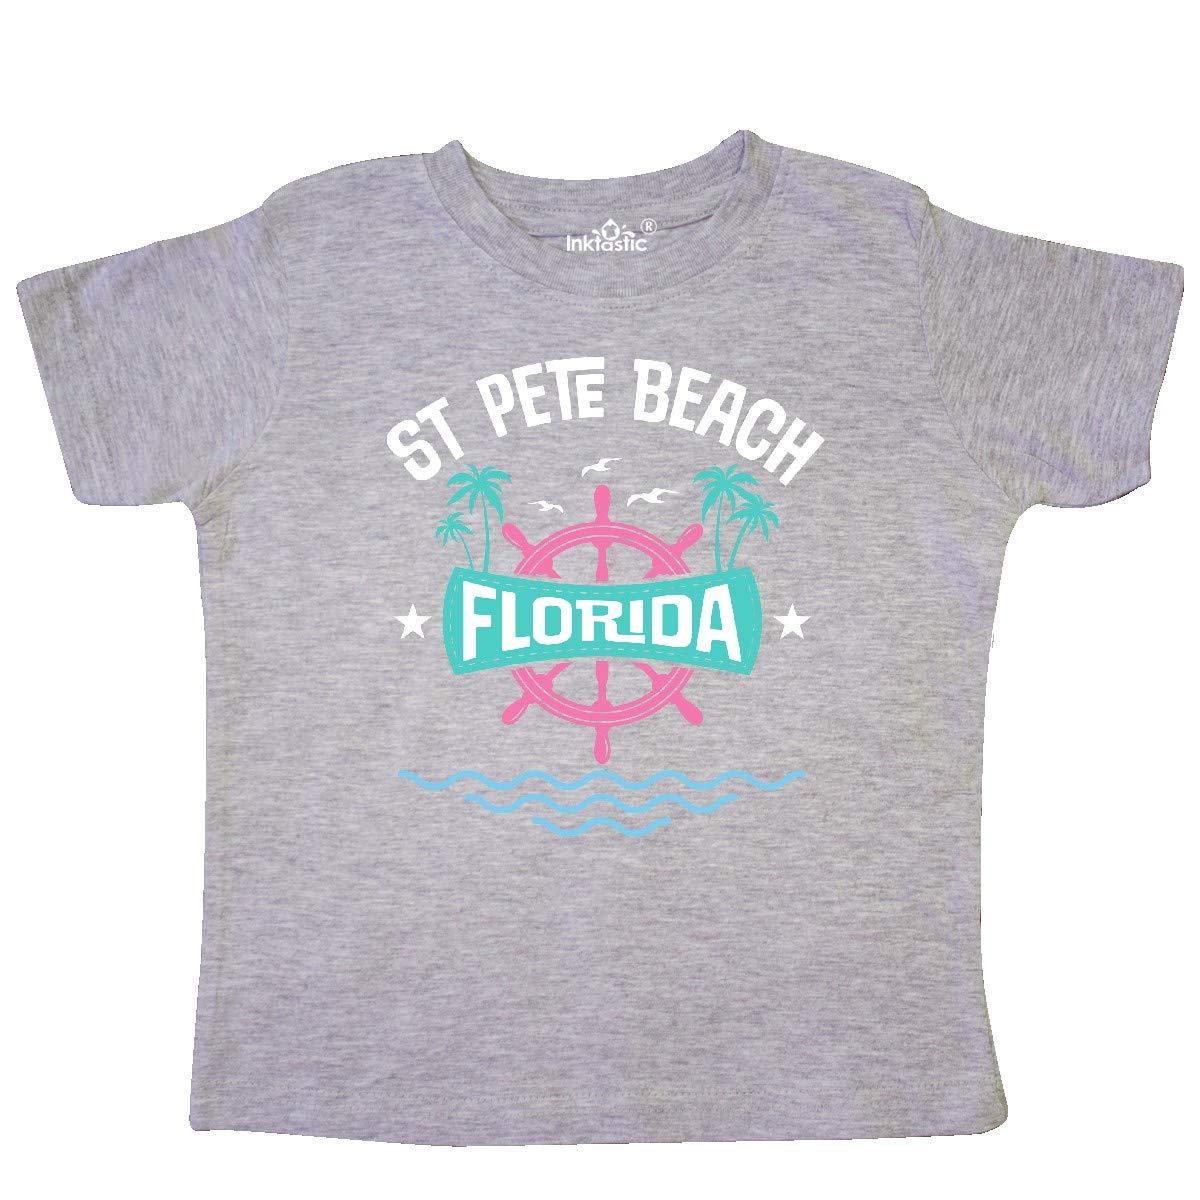 inktastic St Pete Beach Florida Toddler T-Shirt